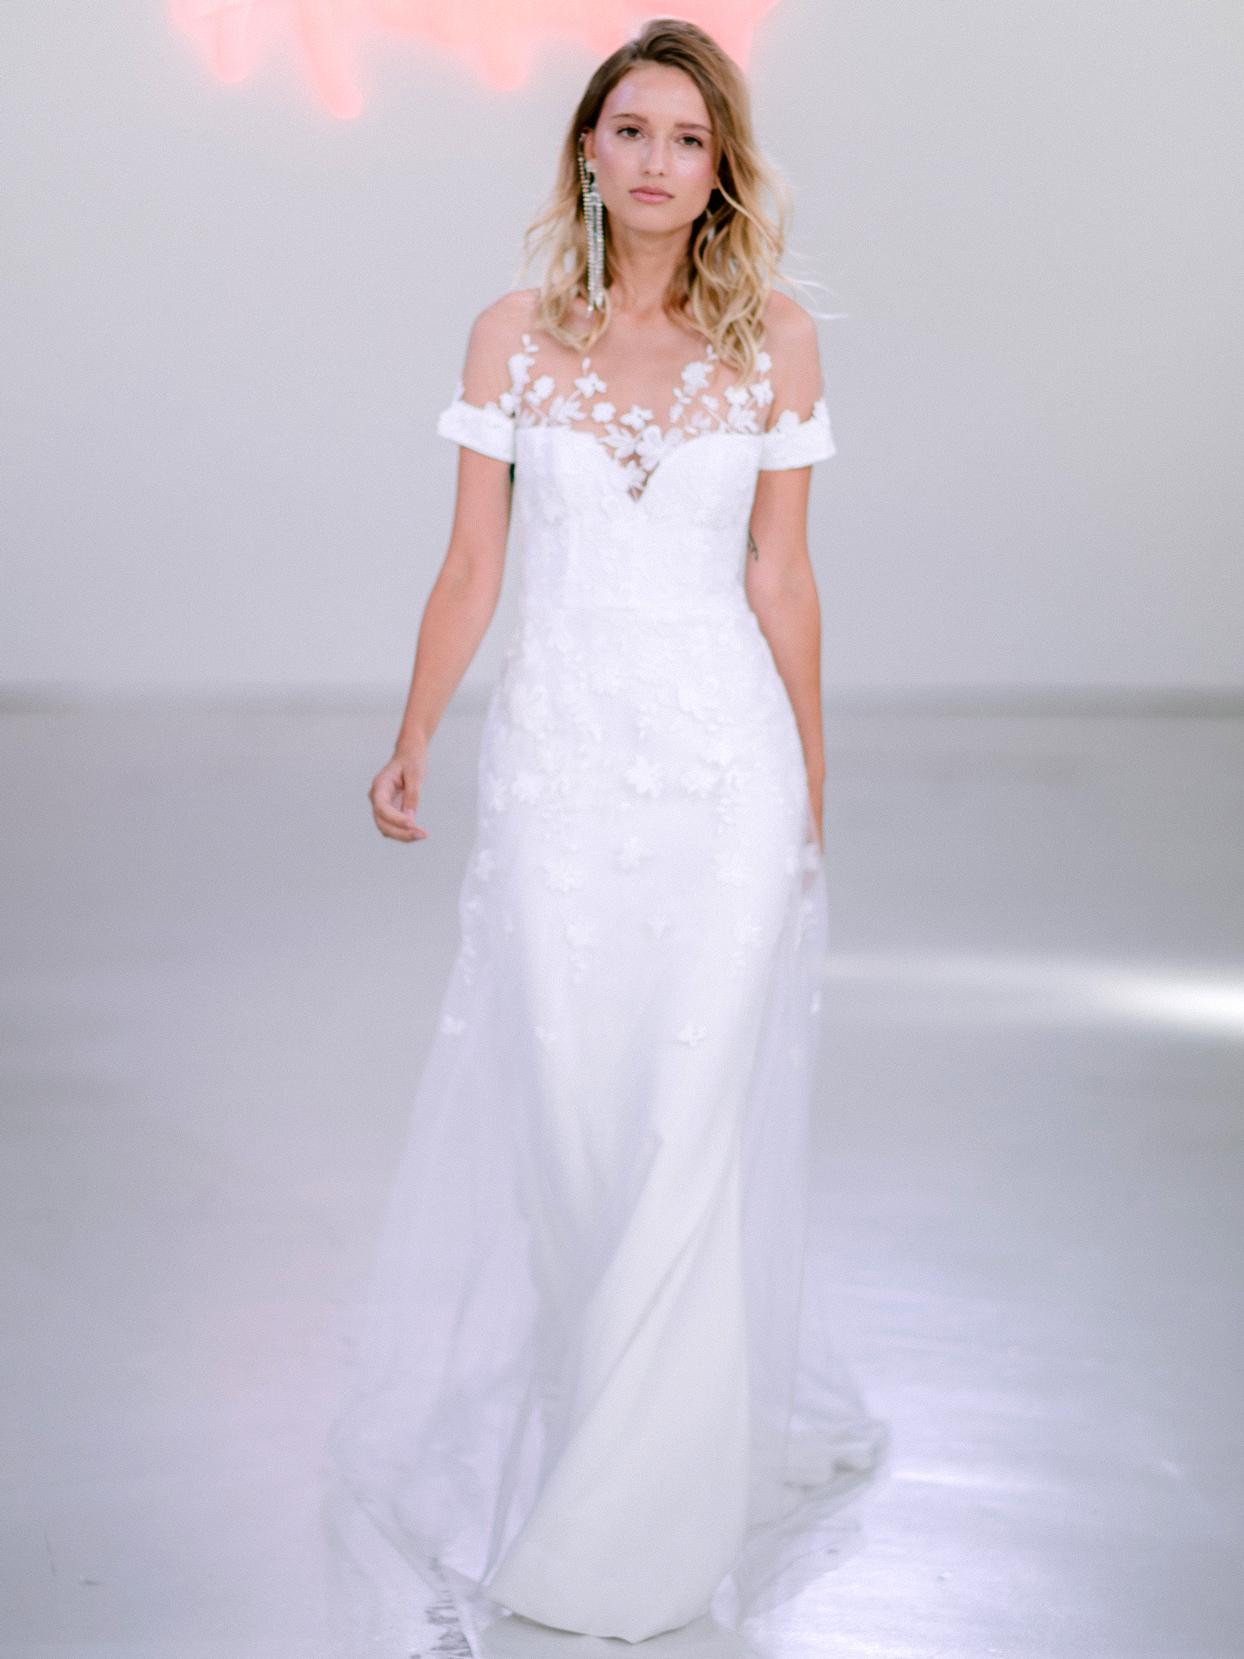 Rime Arodaky X The Mews Bridal illusion lace high neck short sleeve wedding dress fall 2020